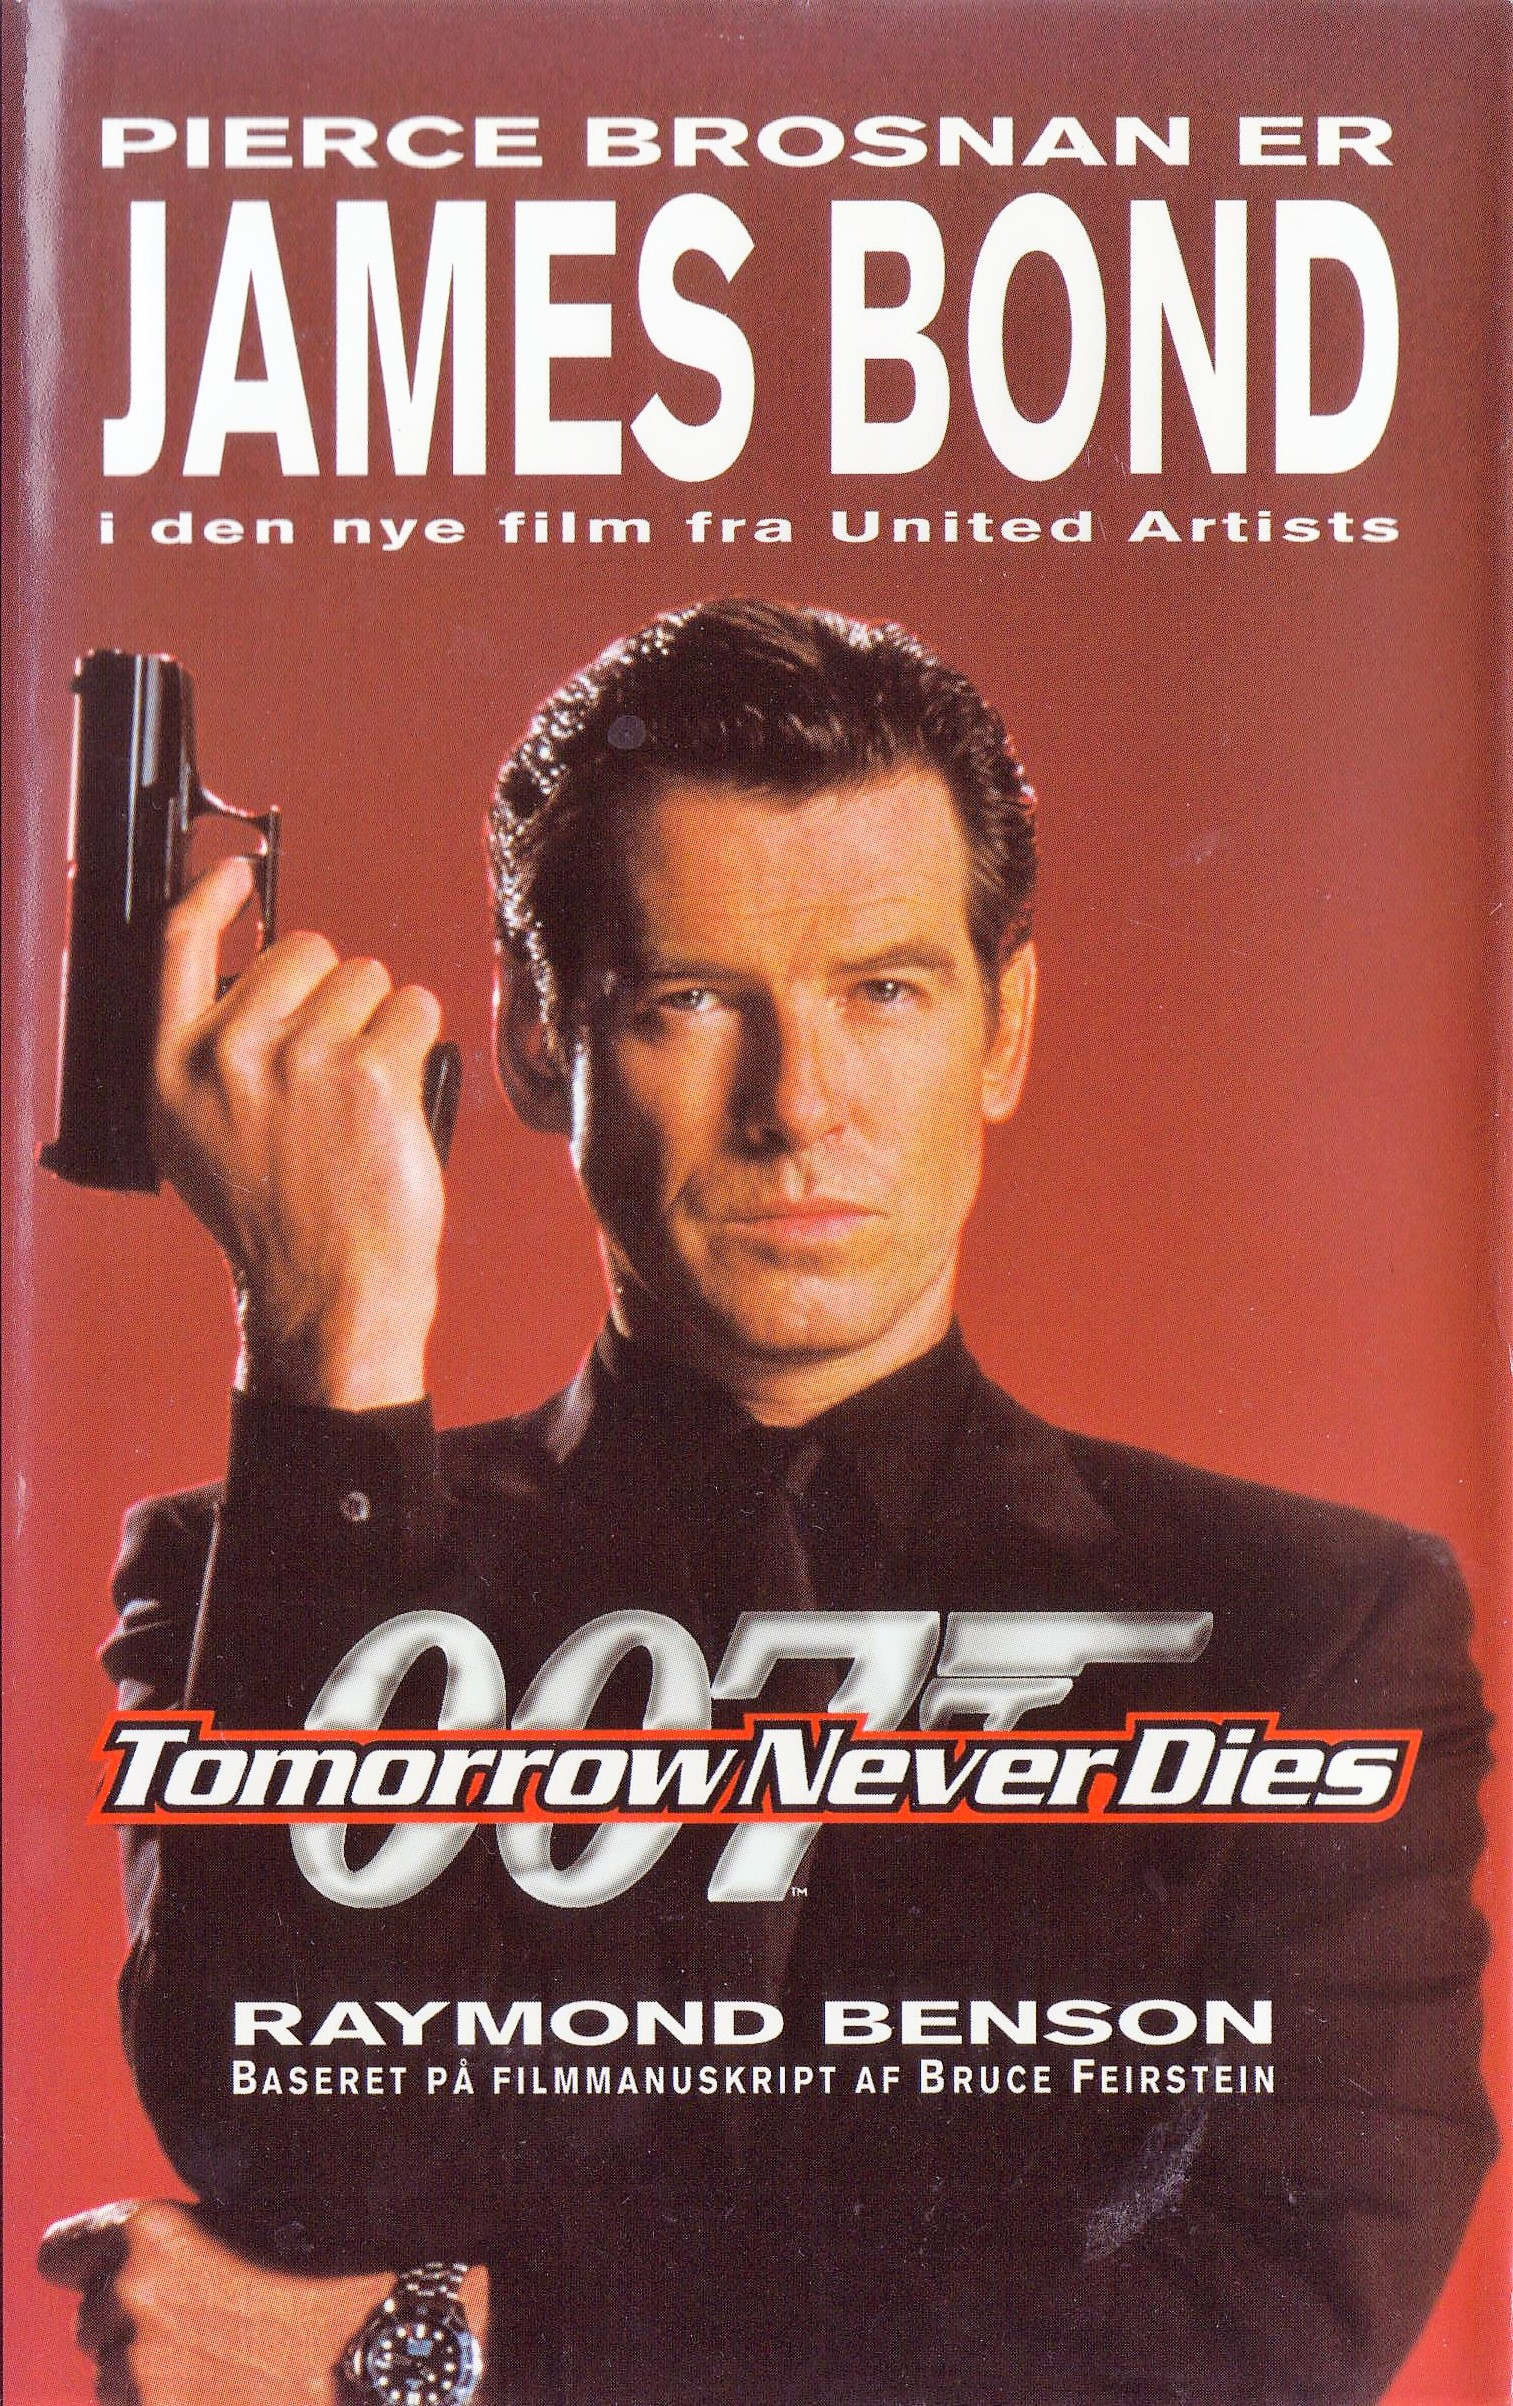 Tomorrow Never Dies Novelization Danish Hardcover 1997 James Bond O Rama Dk